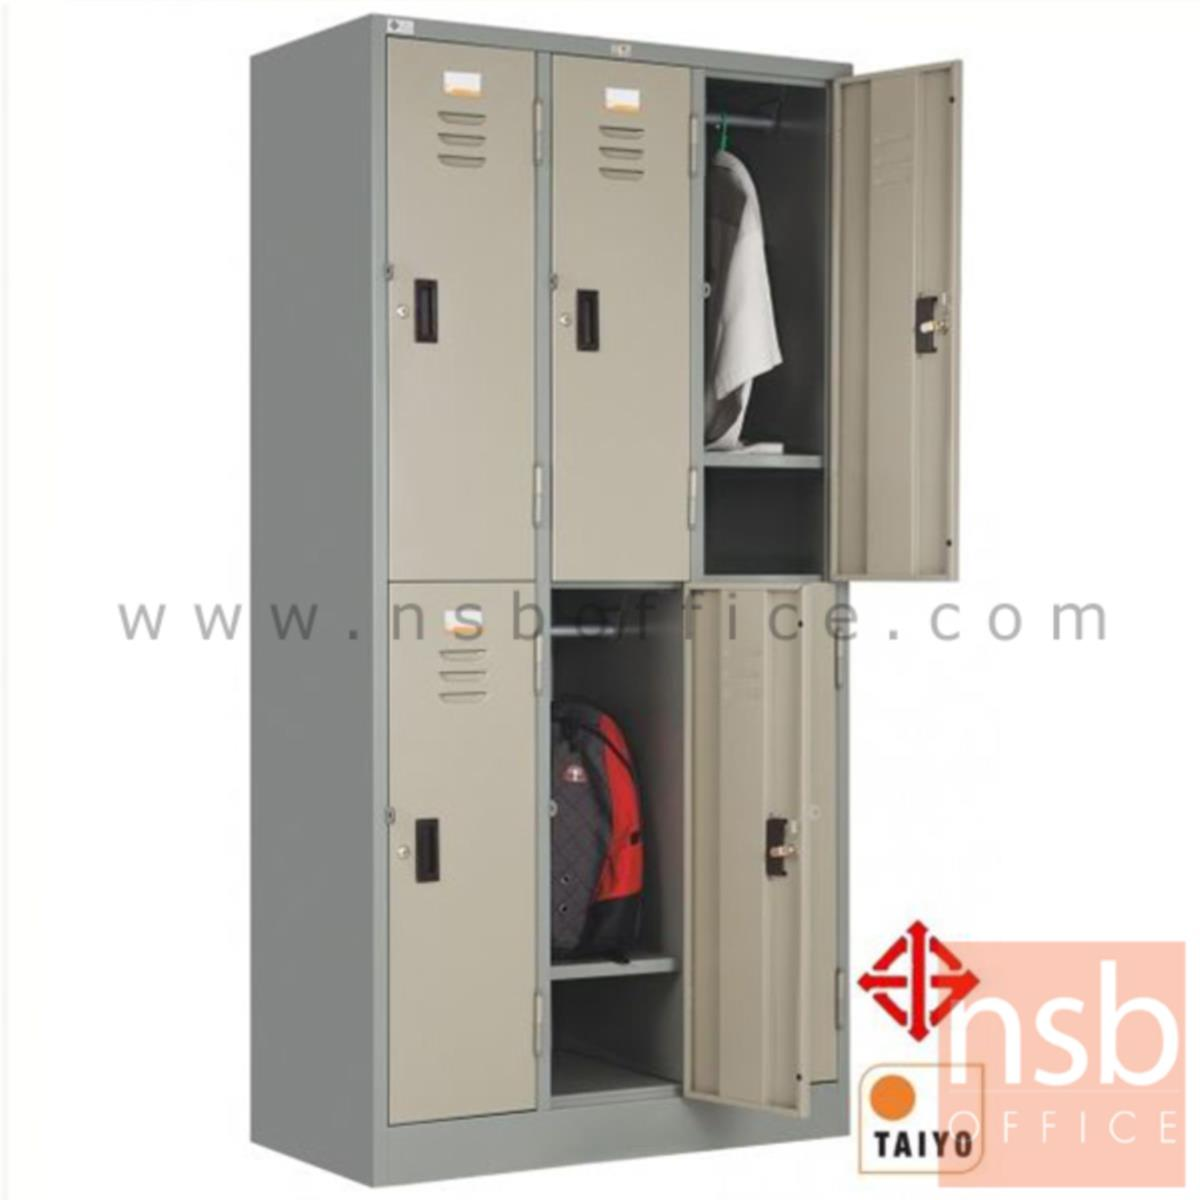 E03A002:ตู้ล็อกเกอร์เหล็ก 6 ประตู กุญแจพร้อมสายยู (มาตรฐาน มอก. 0.7 mm) รุ่น LK-006